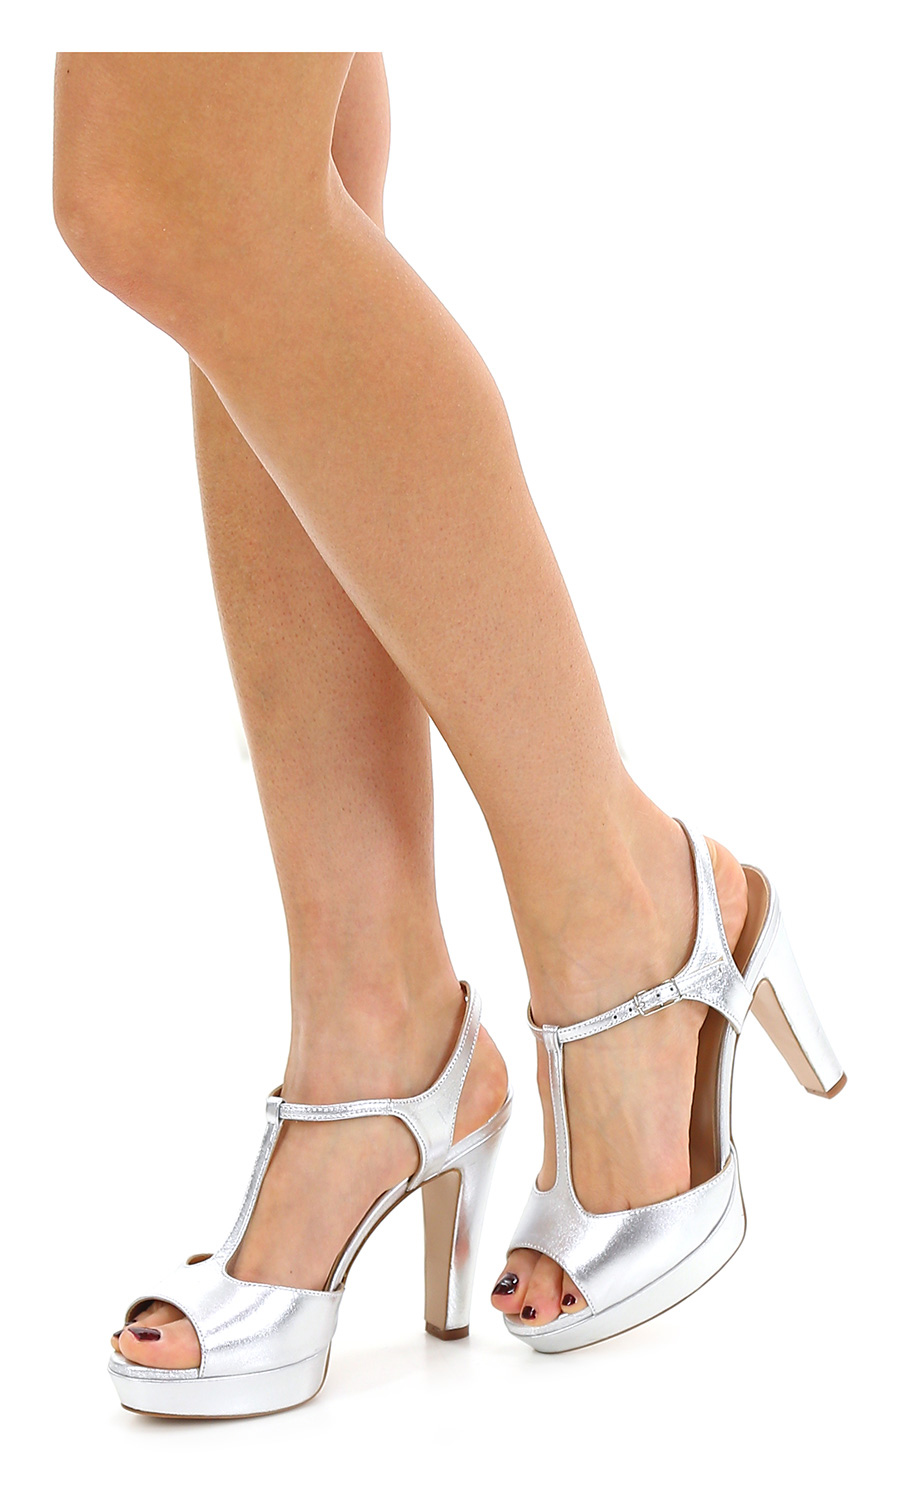 Sandalo alto Argento Alexandra - Le Follie Shop 3a236258b71